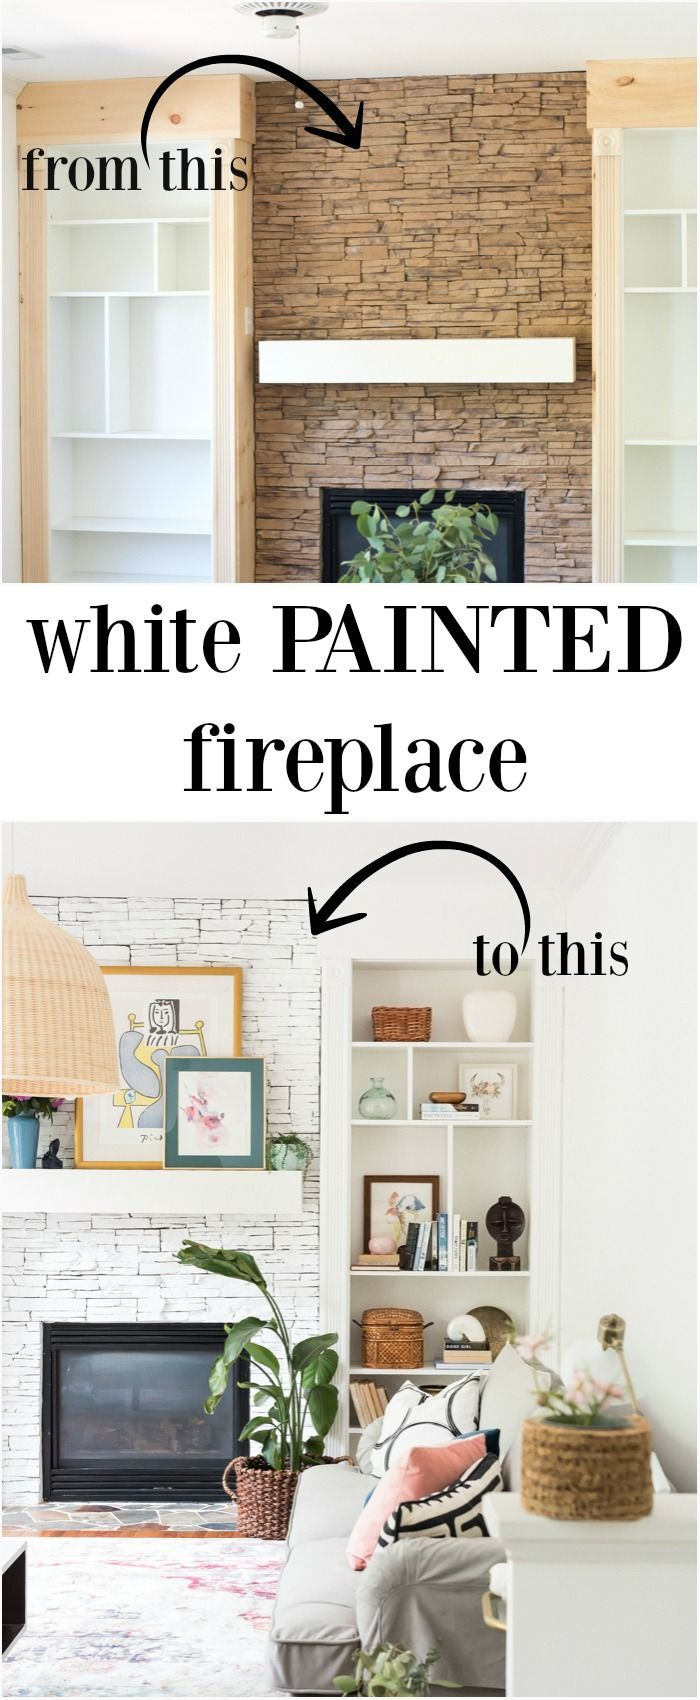 Painted fireplace bright paint fireplace and brick fireplace redo